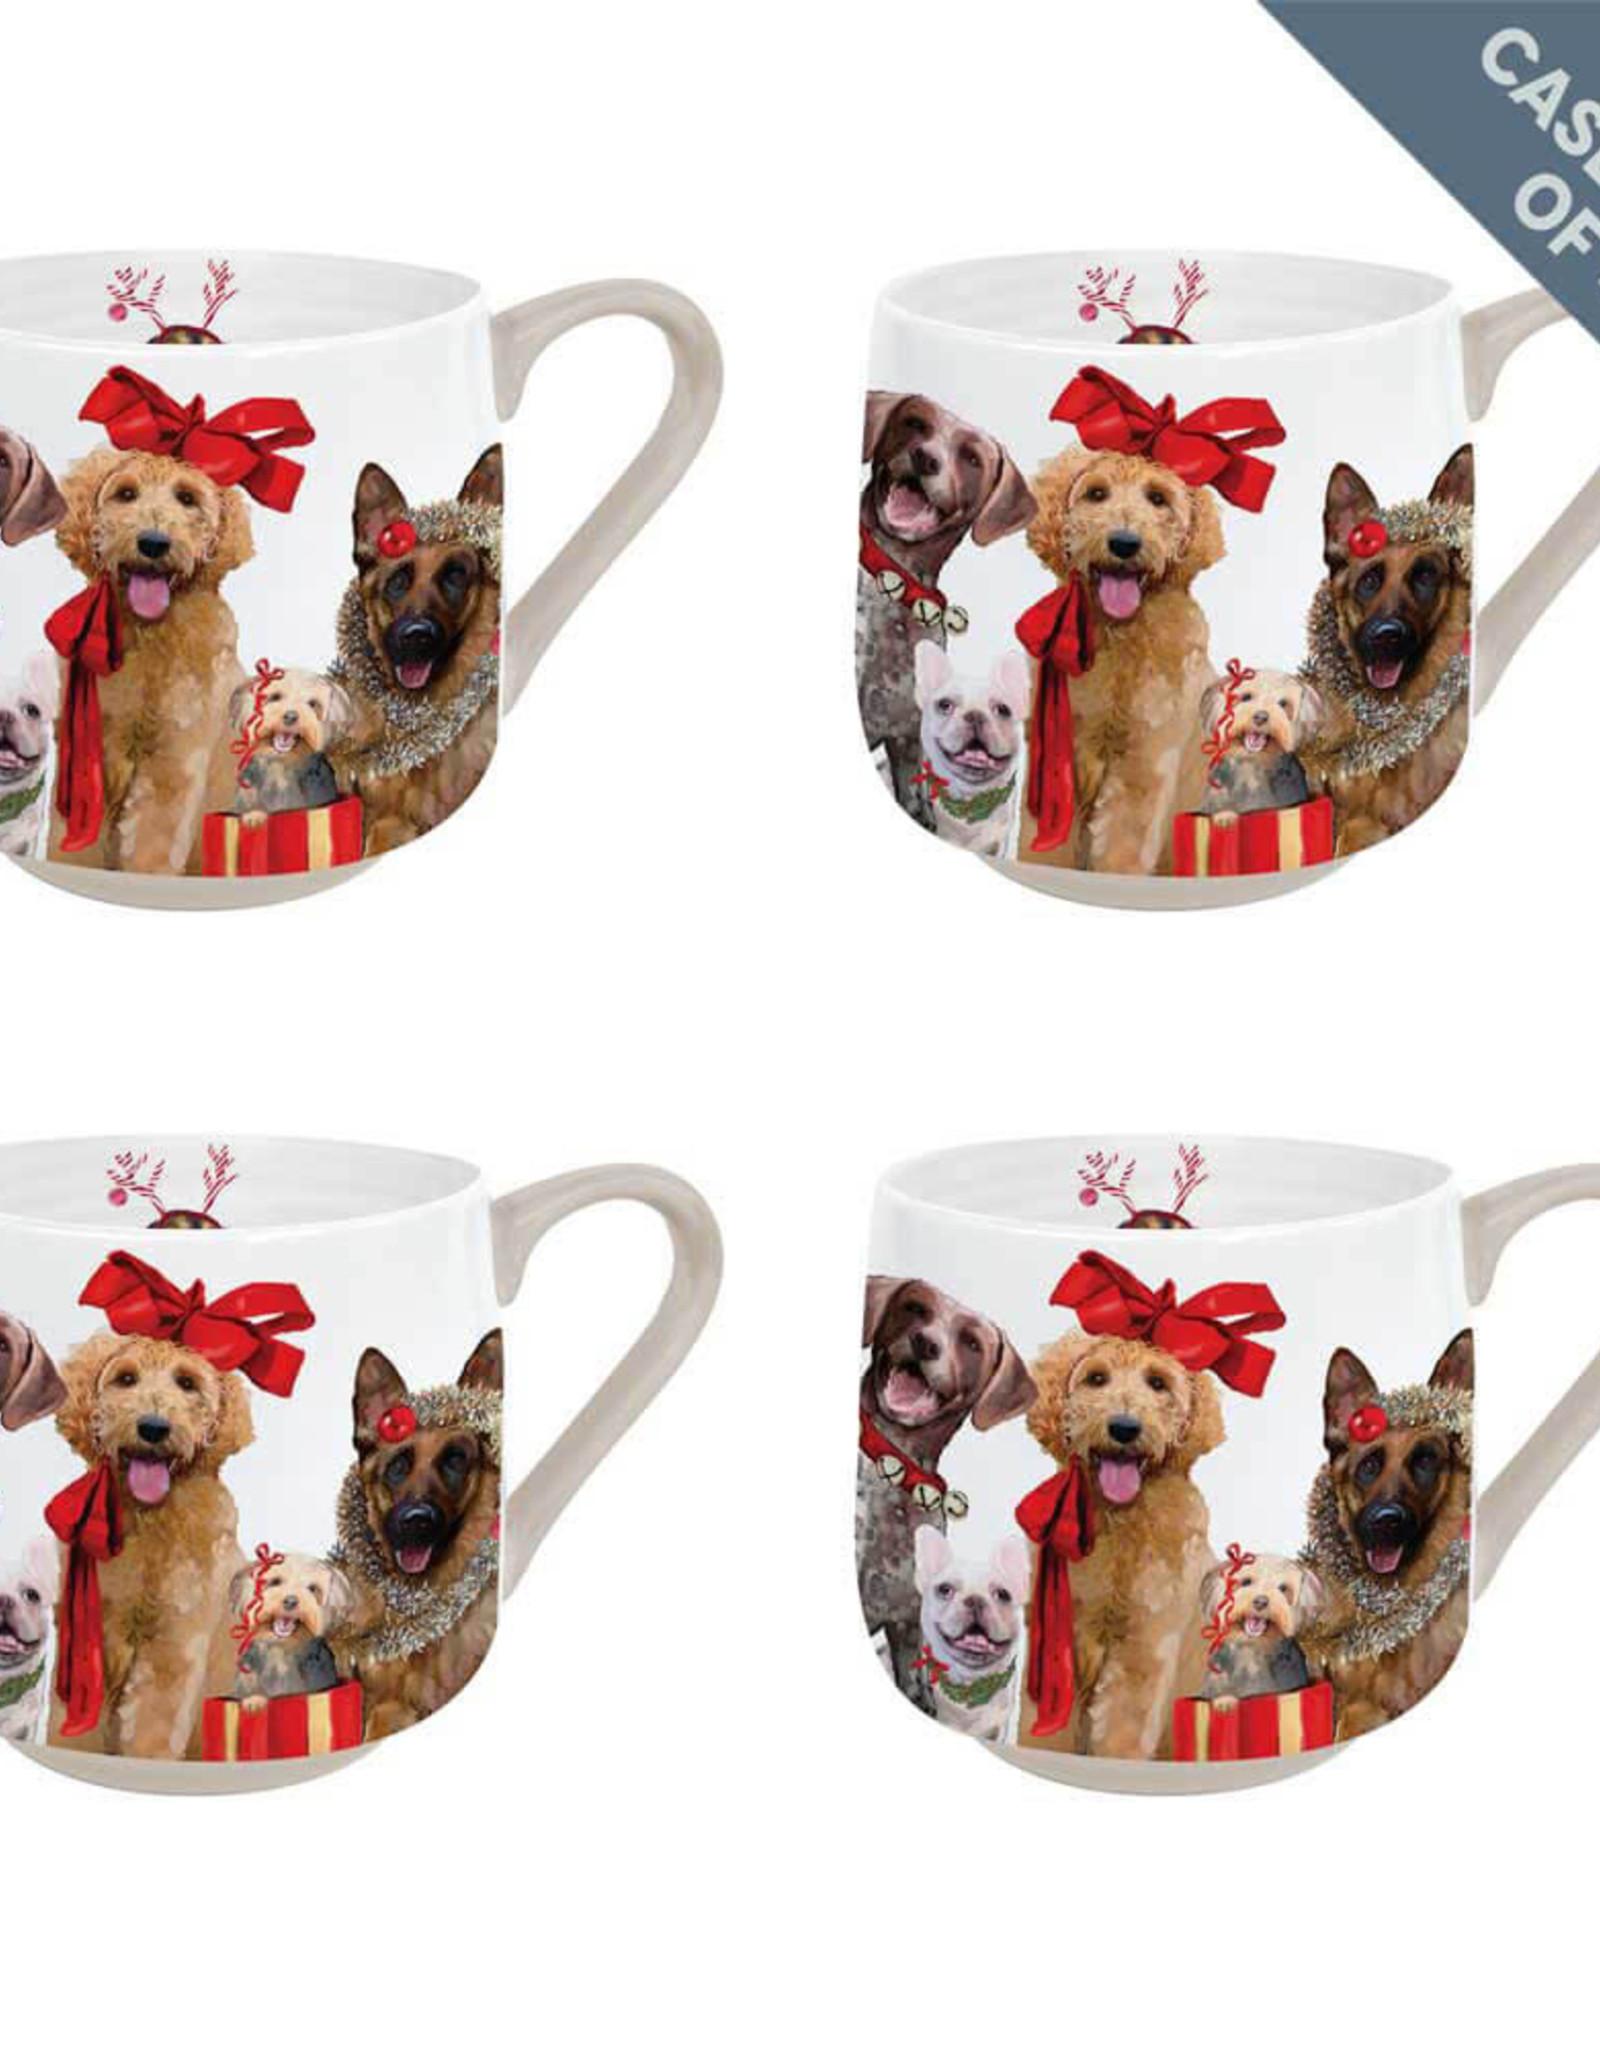 Greenbox Art Holiday-Festive Puppy Pack Case Pack Serveware Mug